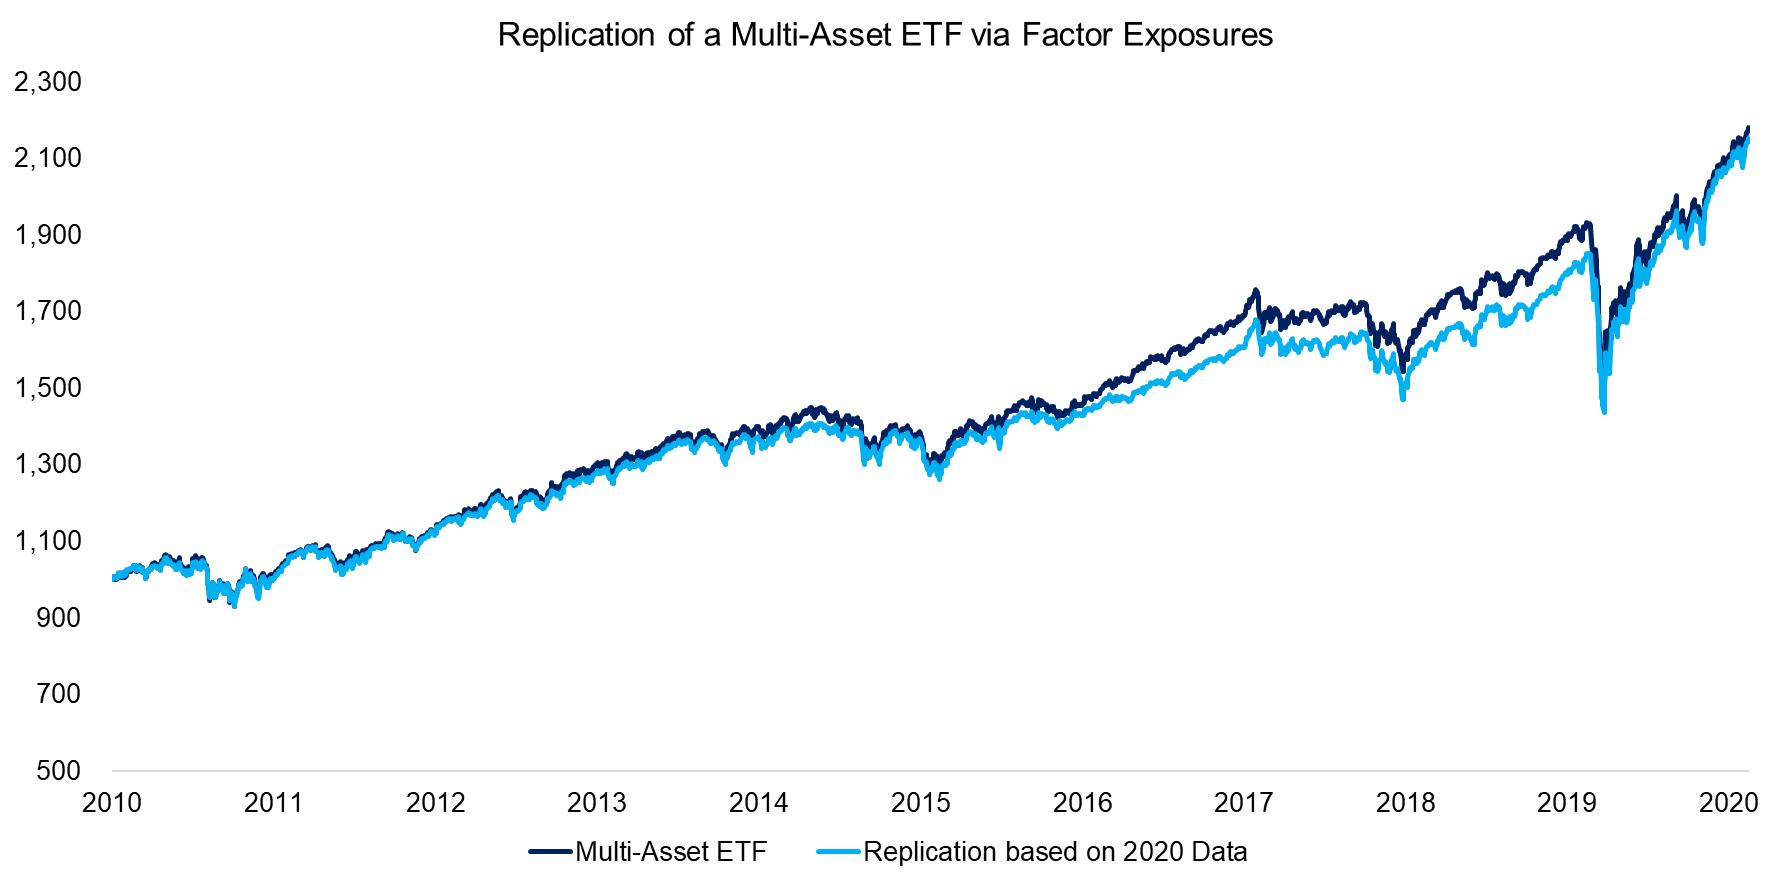 Replication of a Multi-Asset ETF via Factor Exposures